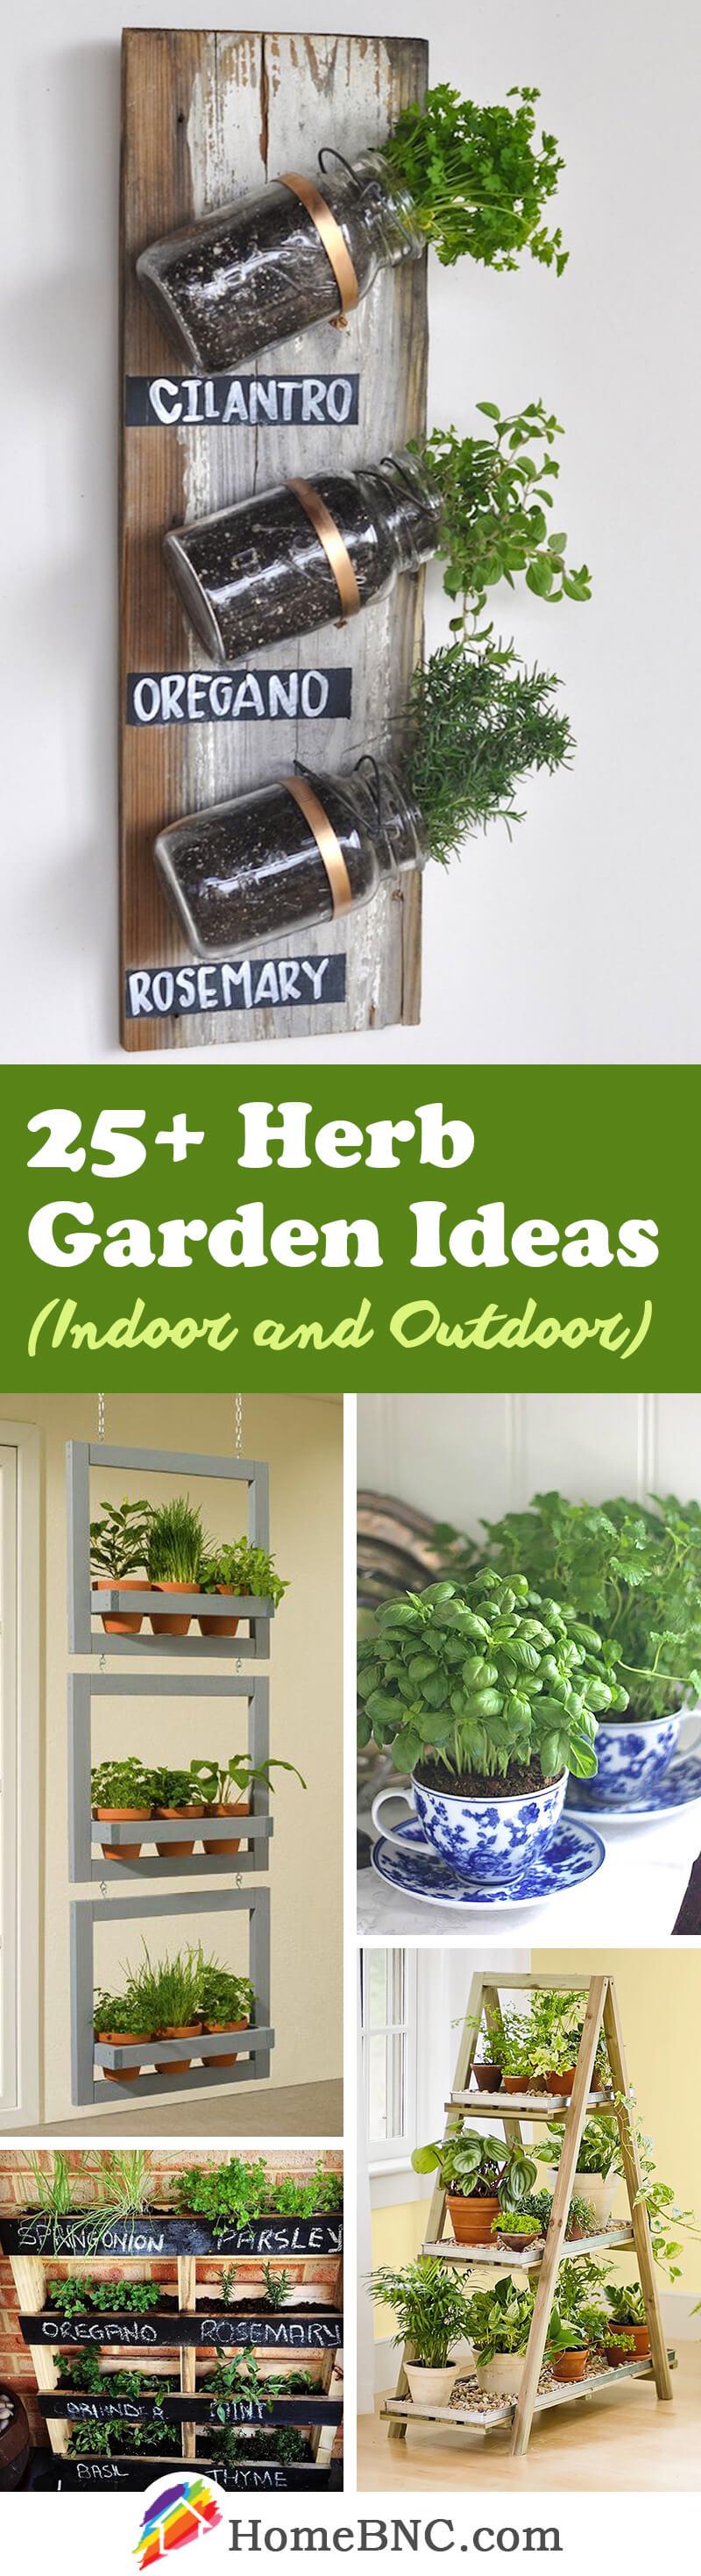 25 Best Herb Garden Ideas And Designs For 2017